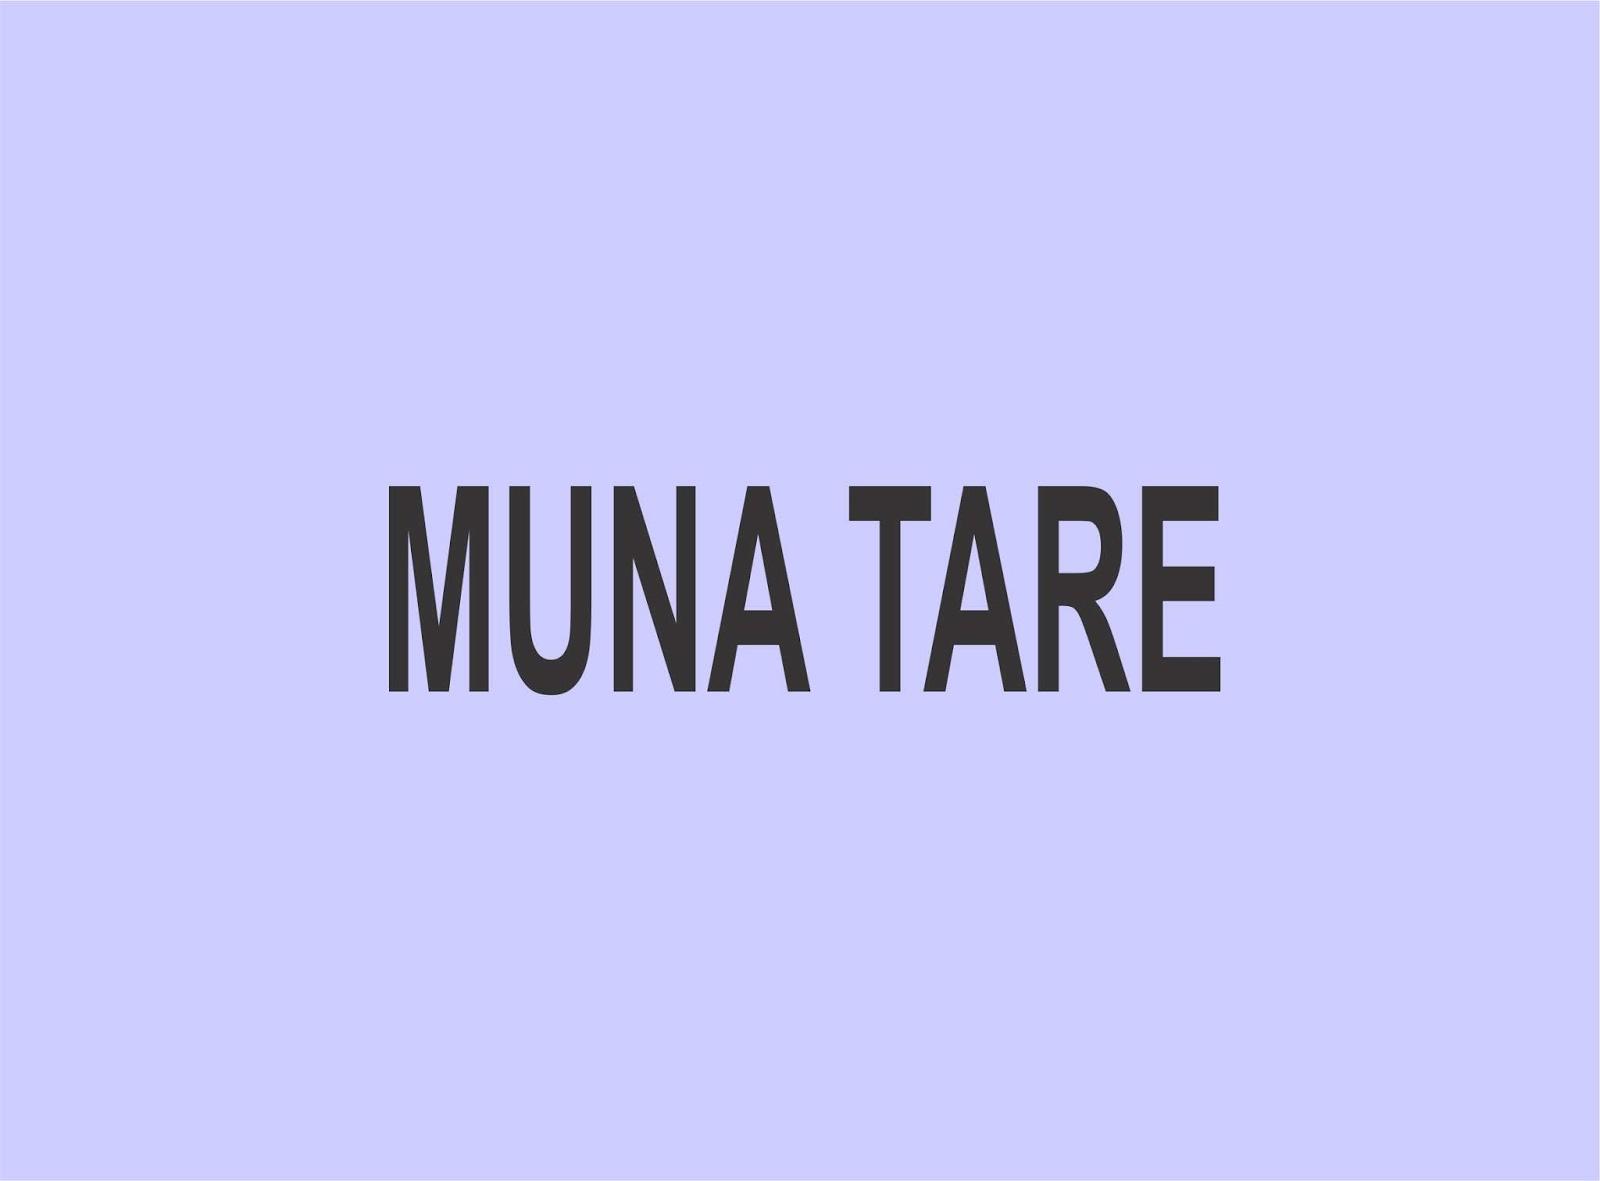 MUNA TARE complete | Dandalin Hausa Novels - Gidan Novels | Hausa Novels